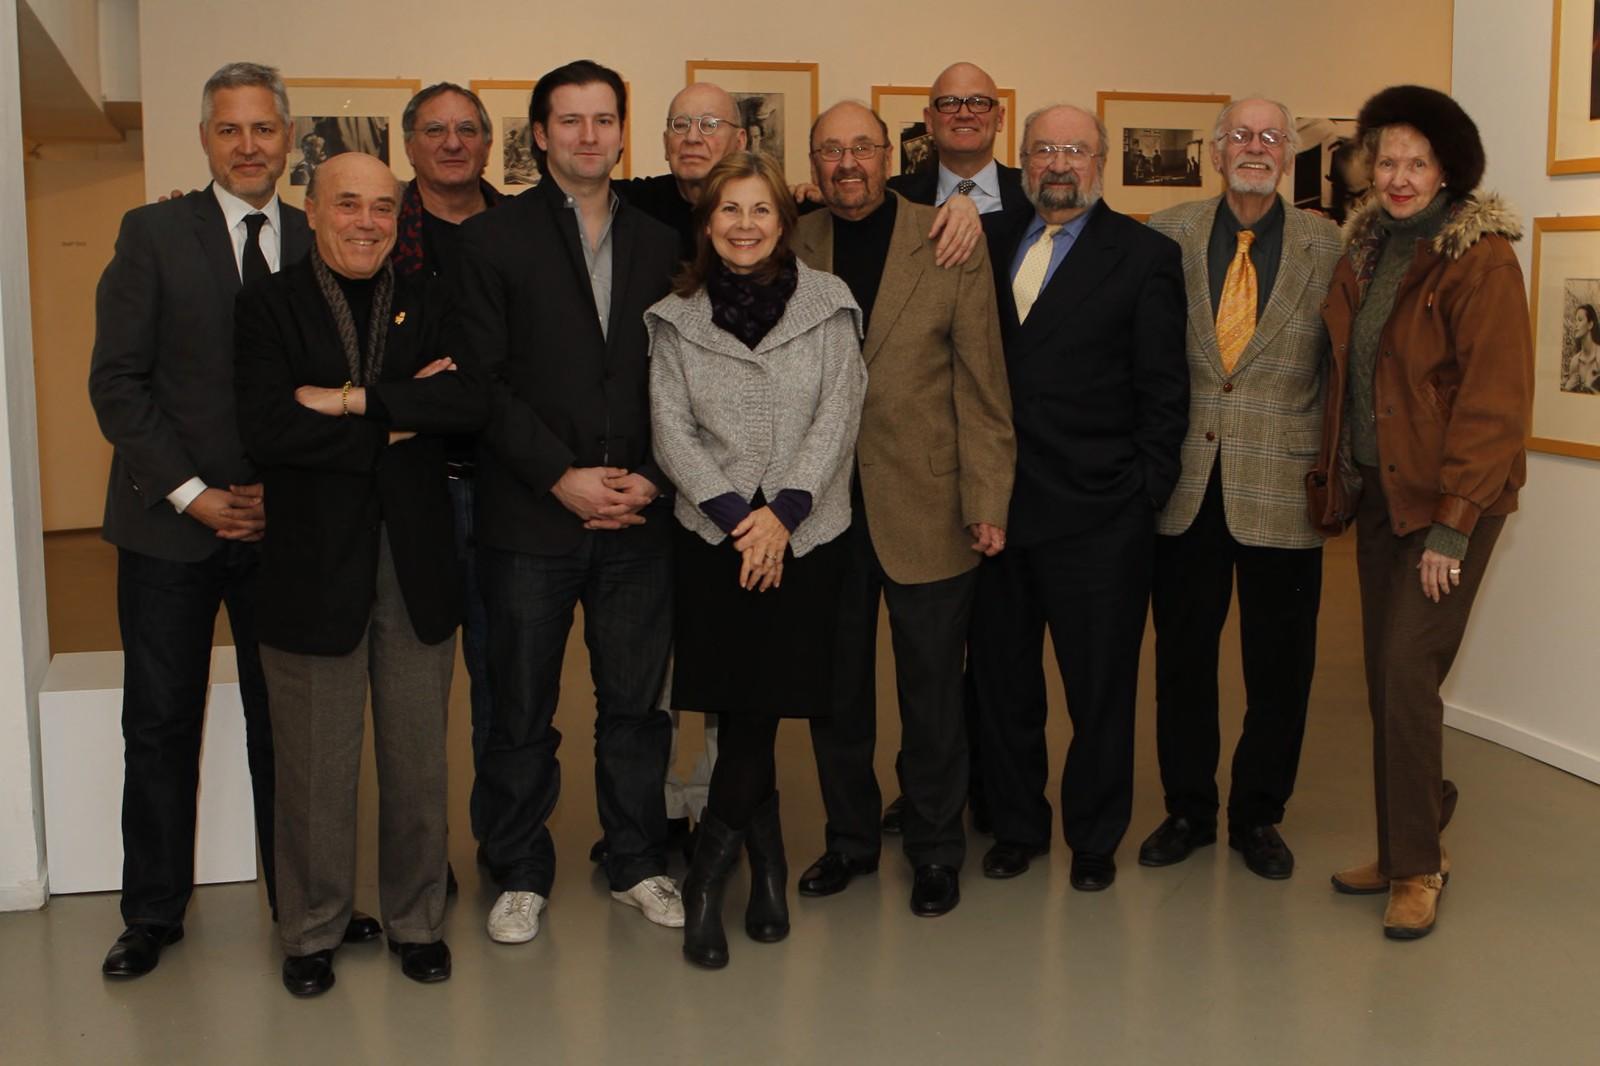 Advisory Board Meeting with a bunch of X-Presidents. George Lois, Paul Lavoie, Richard Wilde, Bill Oberlander, Kurt Haiman, Ed Brodsky, and Eileen Hedy Shultz.   Kurt Haiman